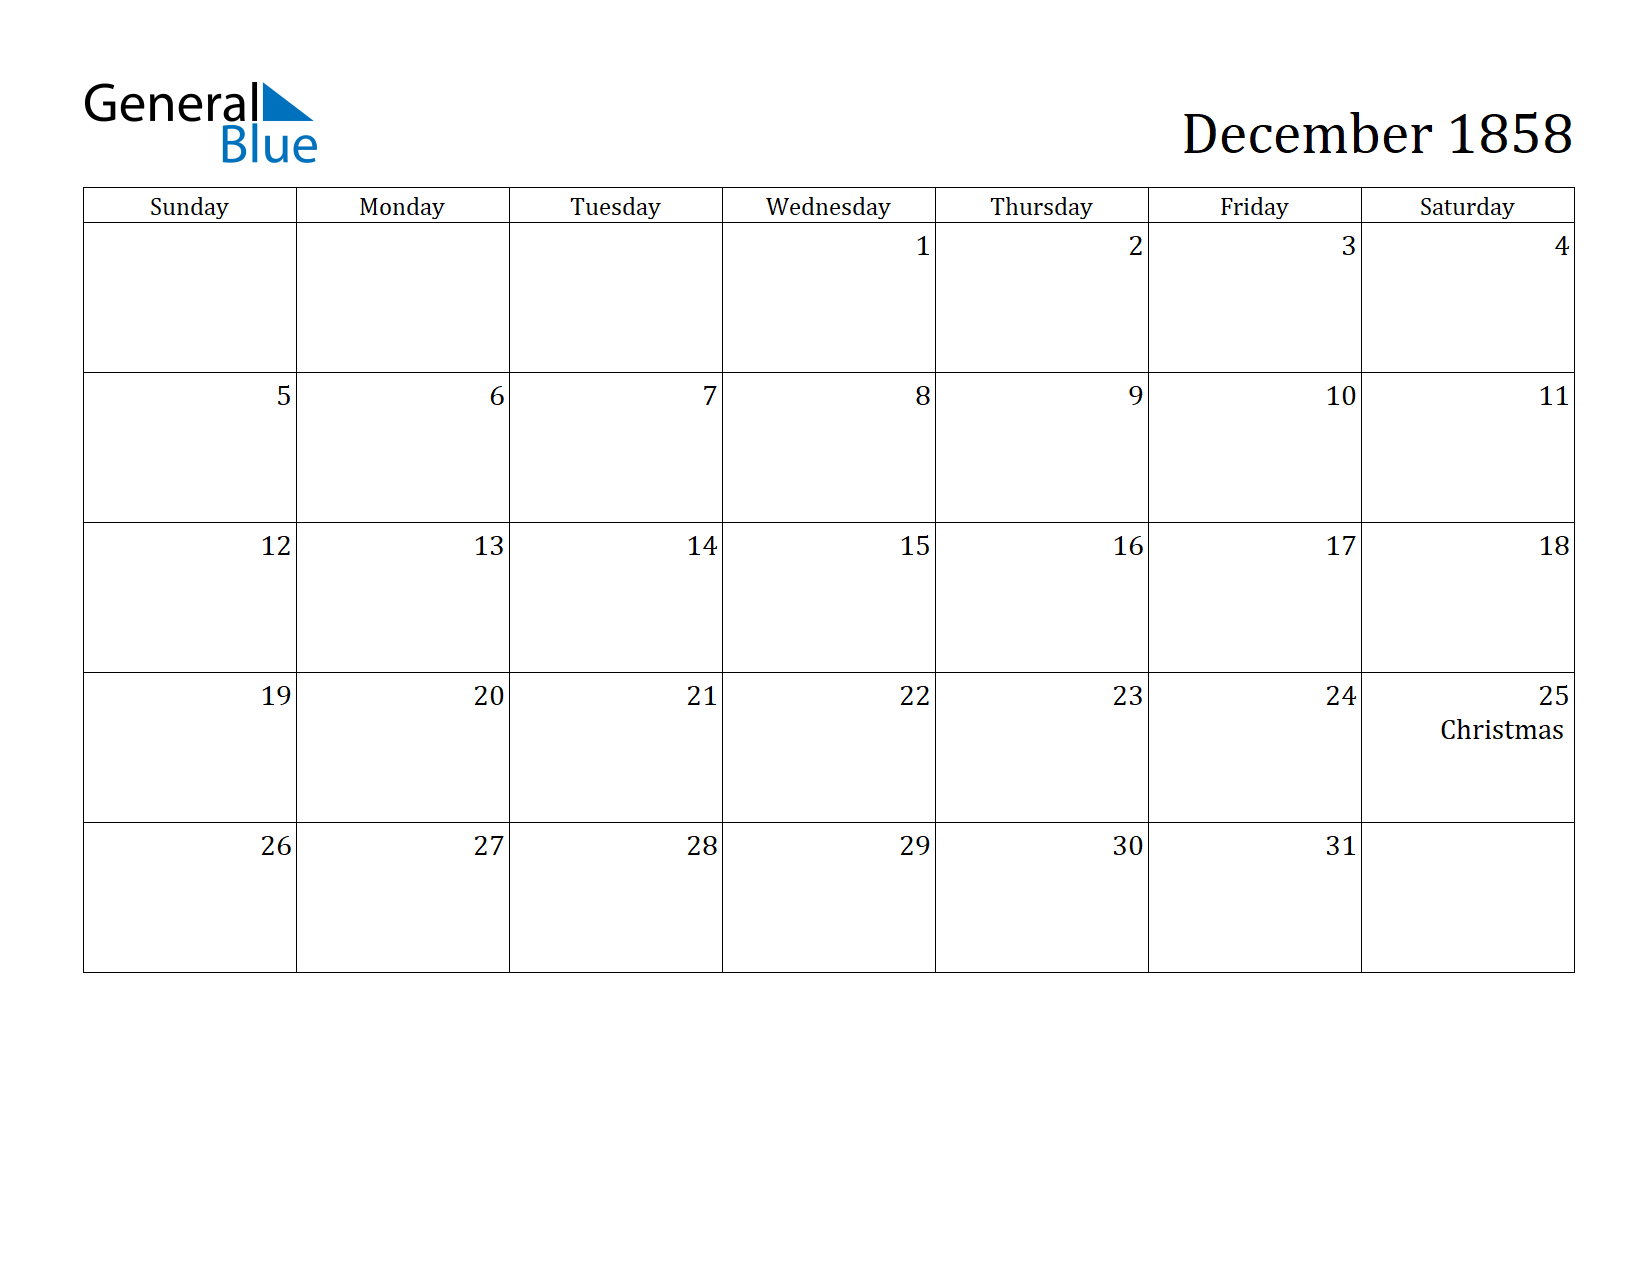 Image of December 1858 Calendar